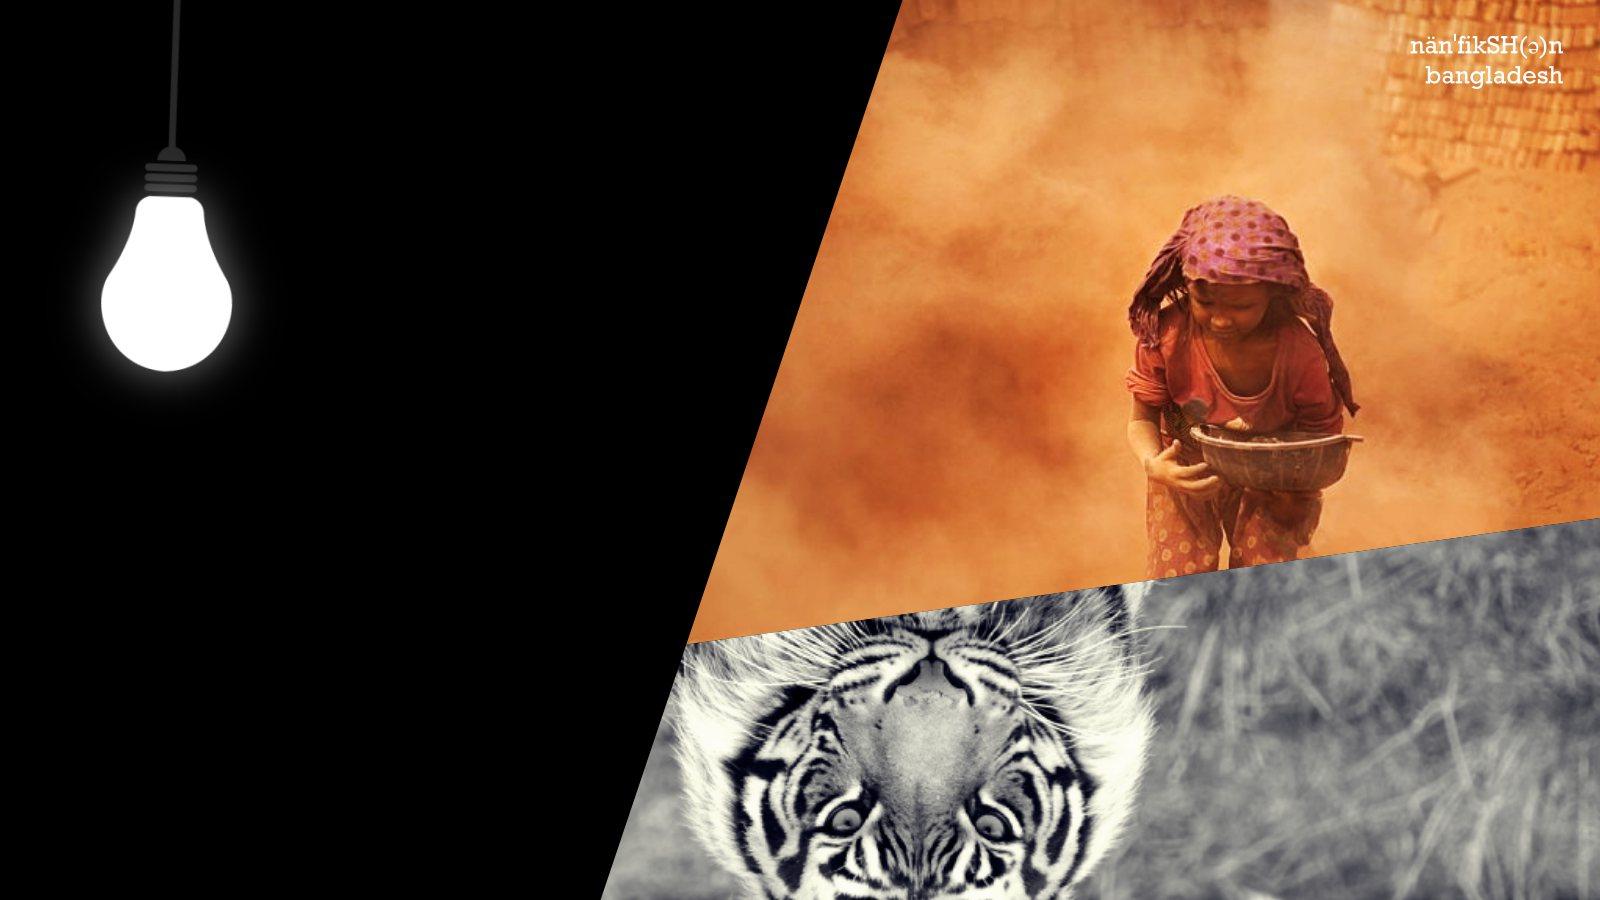 Documentary Films on Bangladesh-Part 8